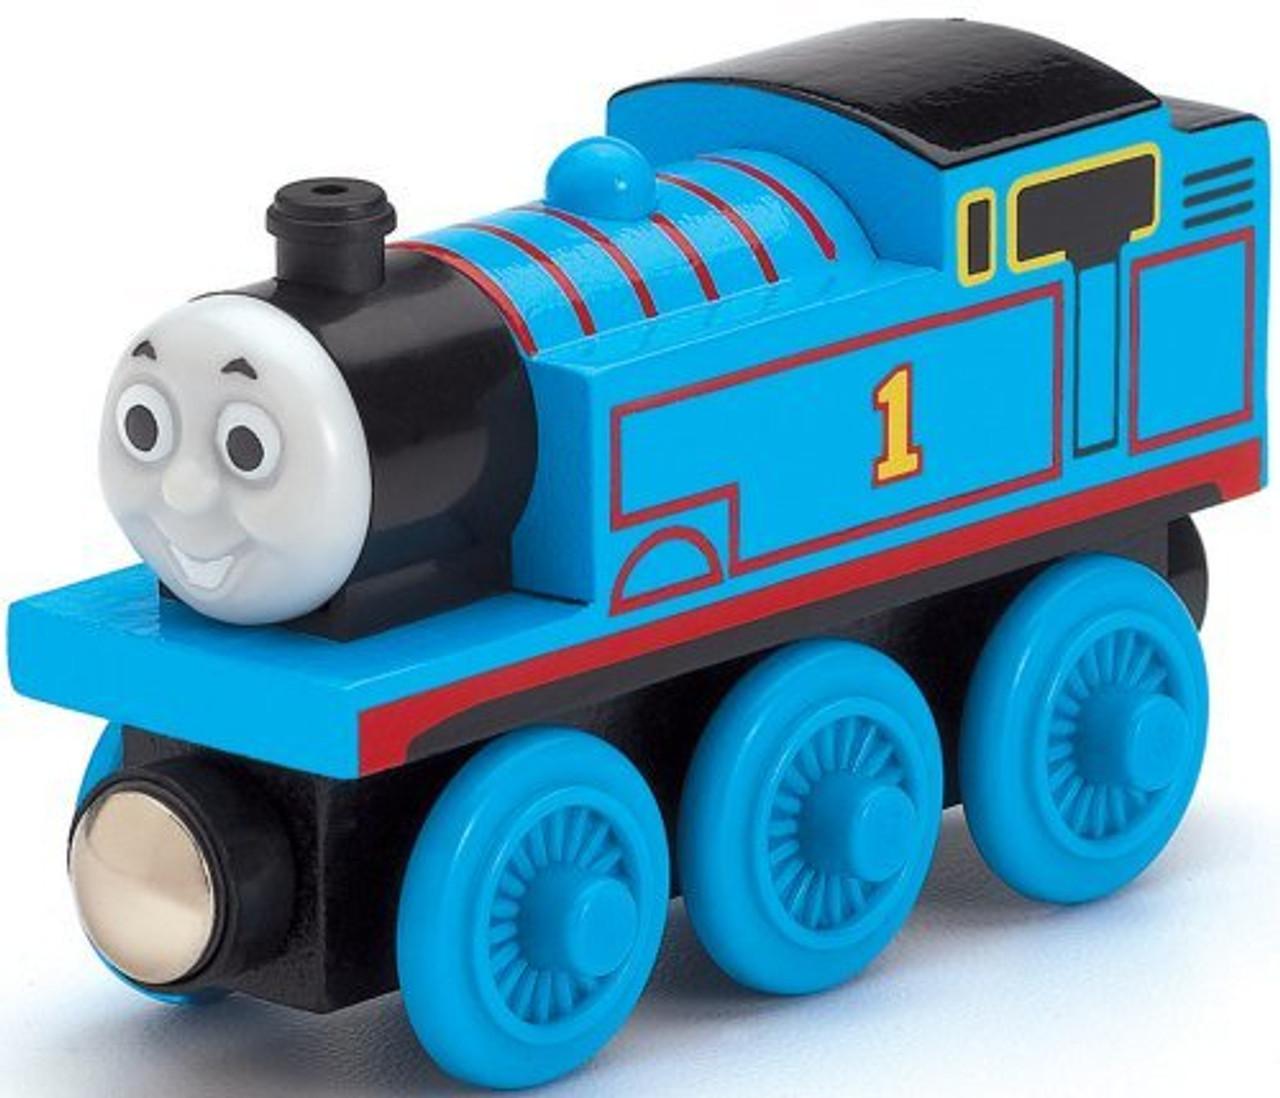 TRAINS - Wooden Railway - Thomas the Tank Engine